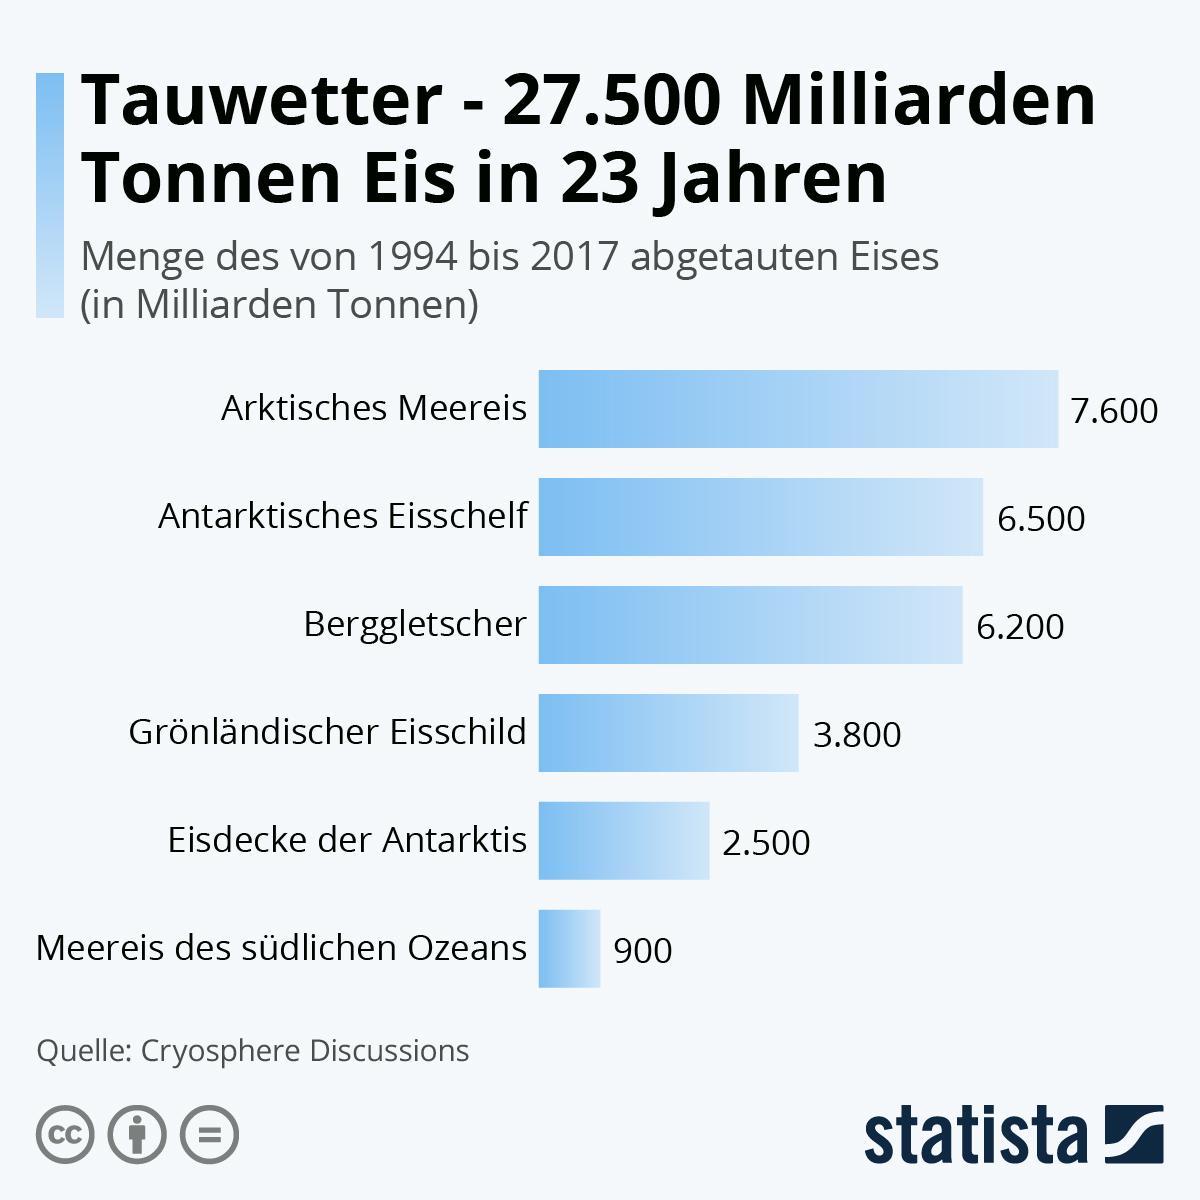 Infografik: Tauwetter - 27.500 Milliarden Tonnen Eis in 23 Jahren | Statista